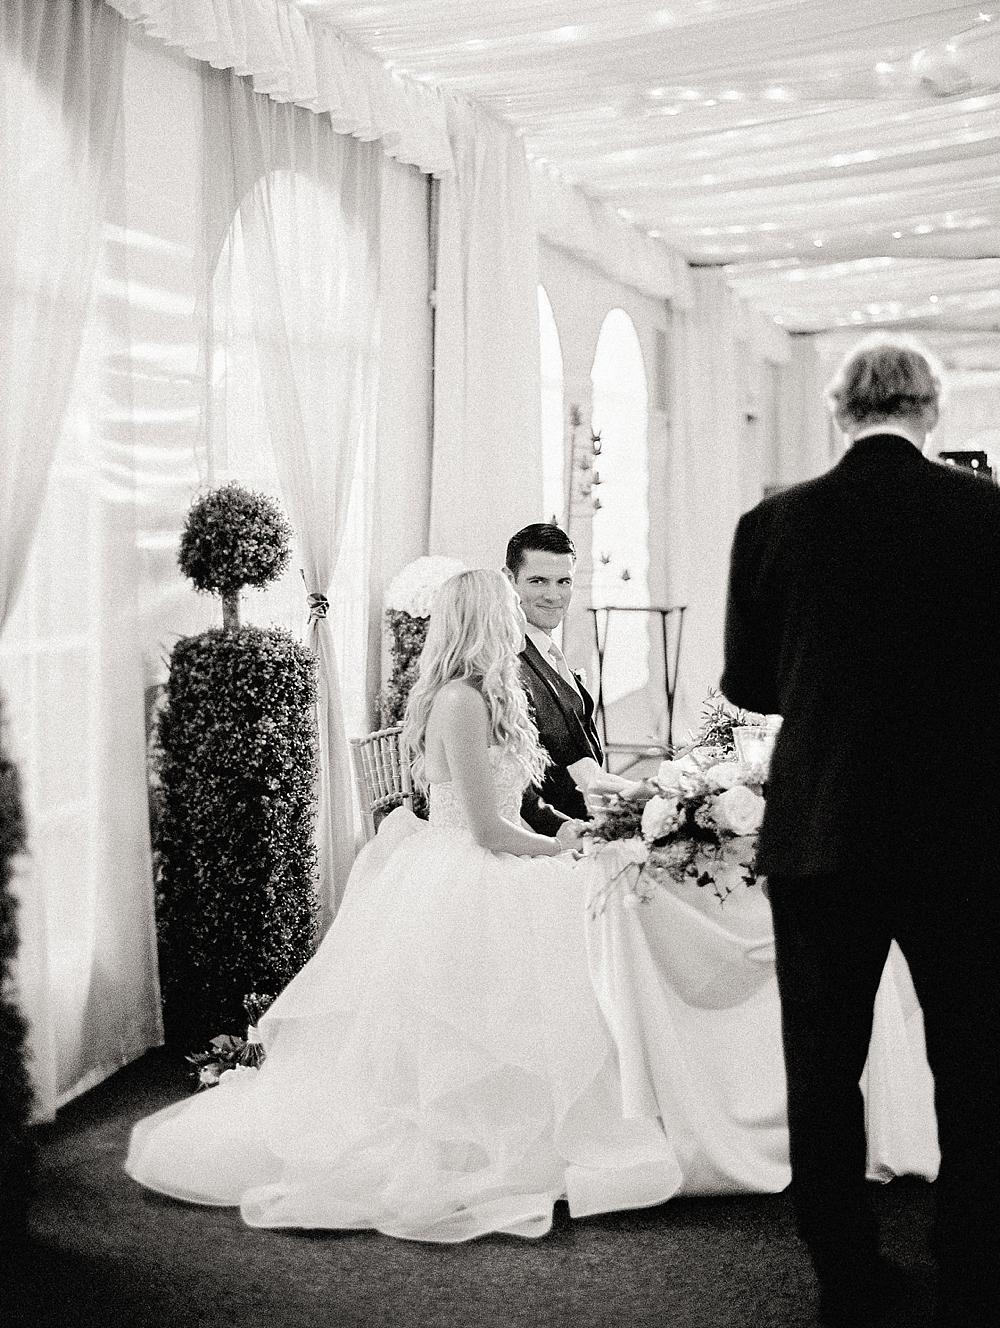 kristin-la-voie-photography-lehmann-mansion-wedding-photographer-84